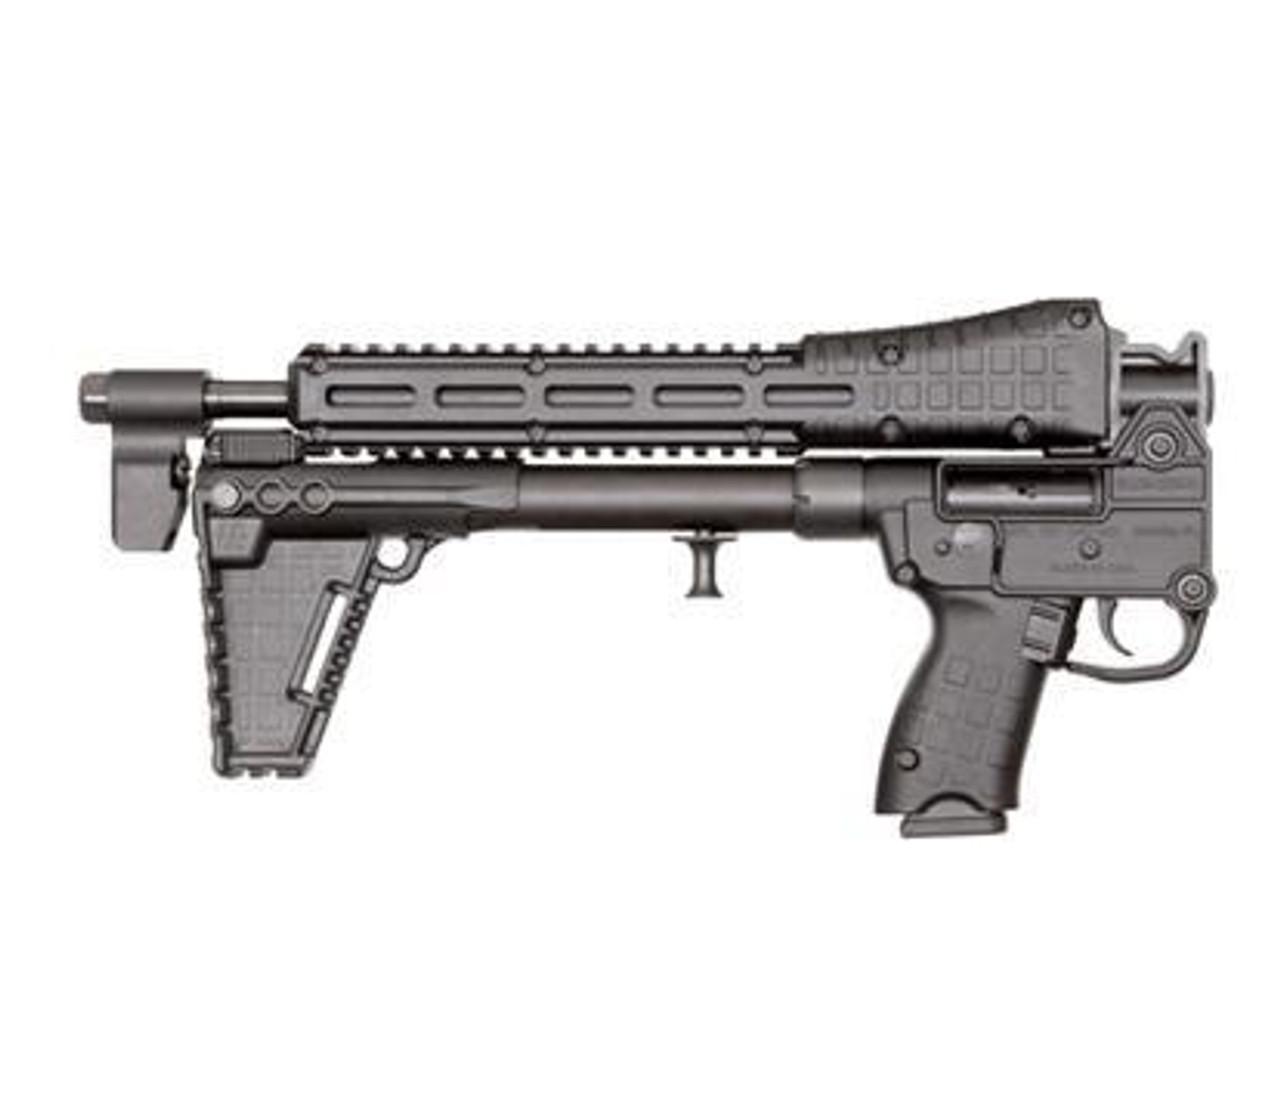 Kel Tec Sub2000 Gen2(GLOCK 19) CALIFORNIA LEGAL- 9mm